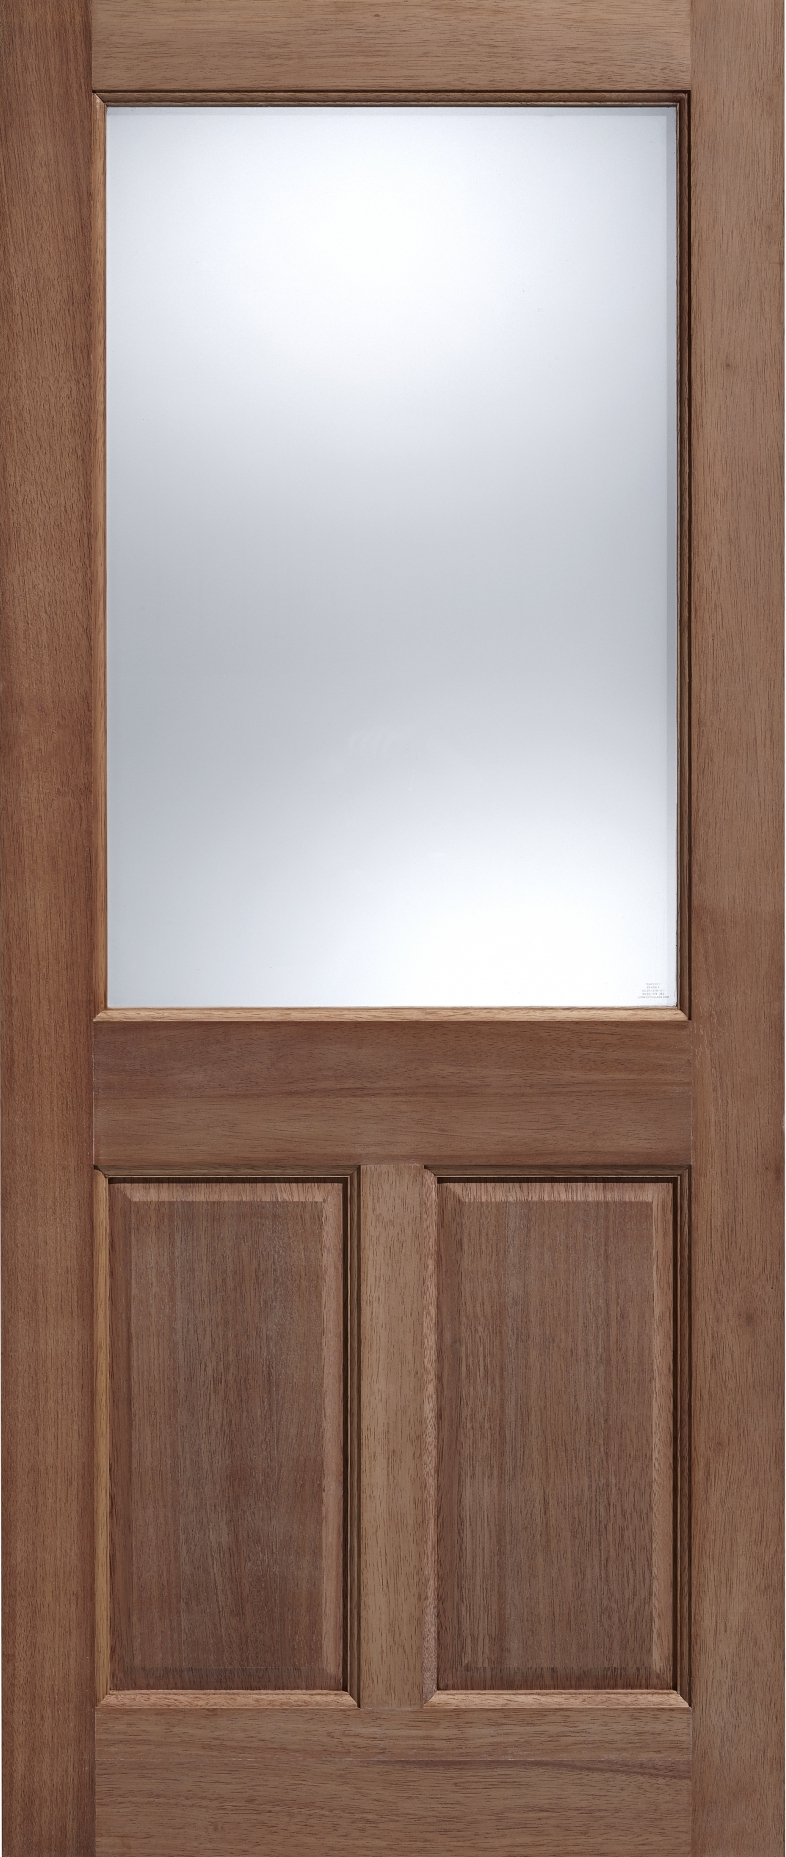 2XG 2 Panel Hardwood & 2XG 2 Panel Hardwood External Doors From Vibrant Doors